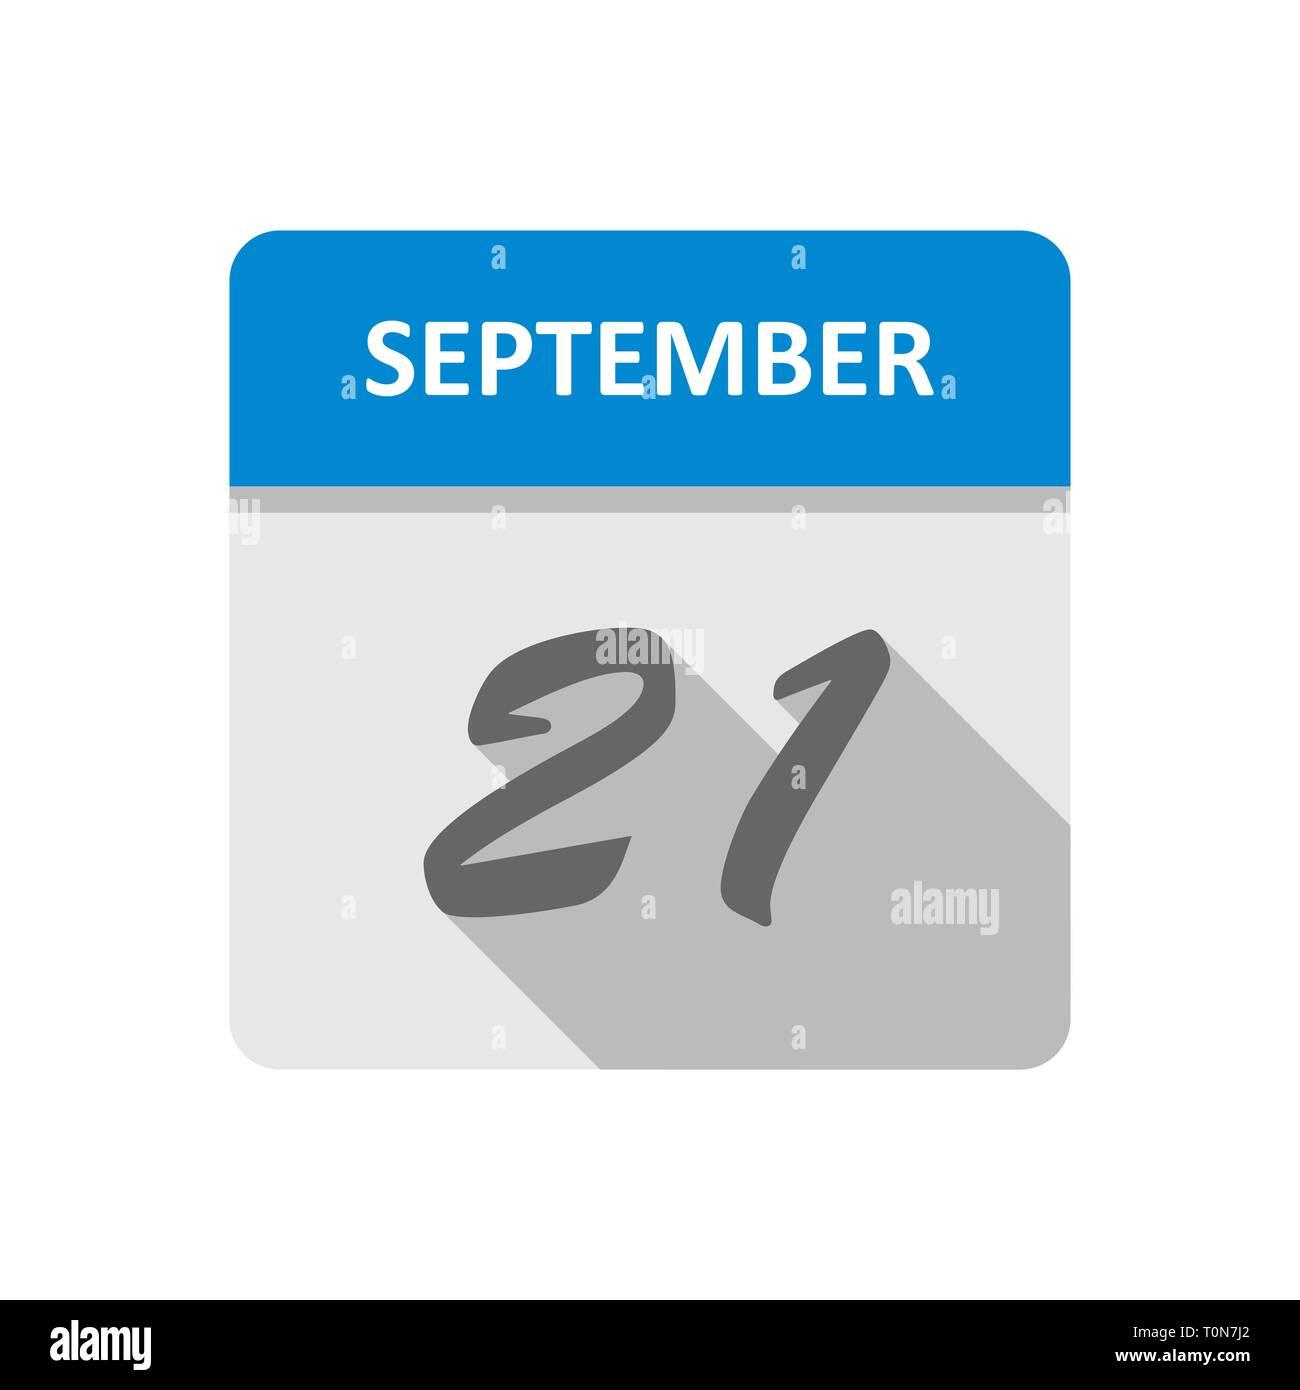 September 21st Date on a Single Day Calendar - Stock Image